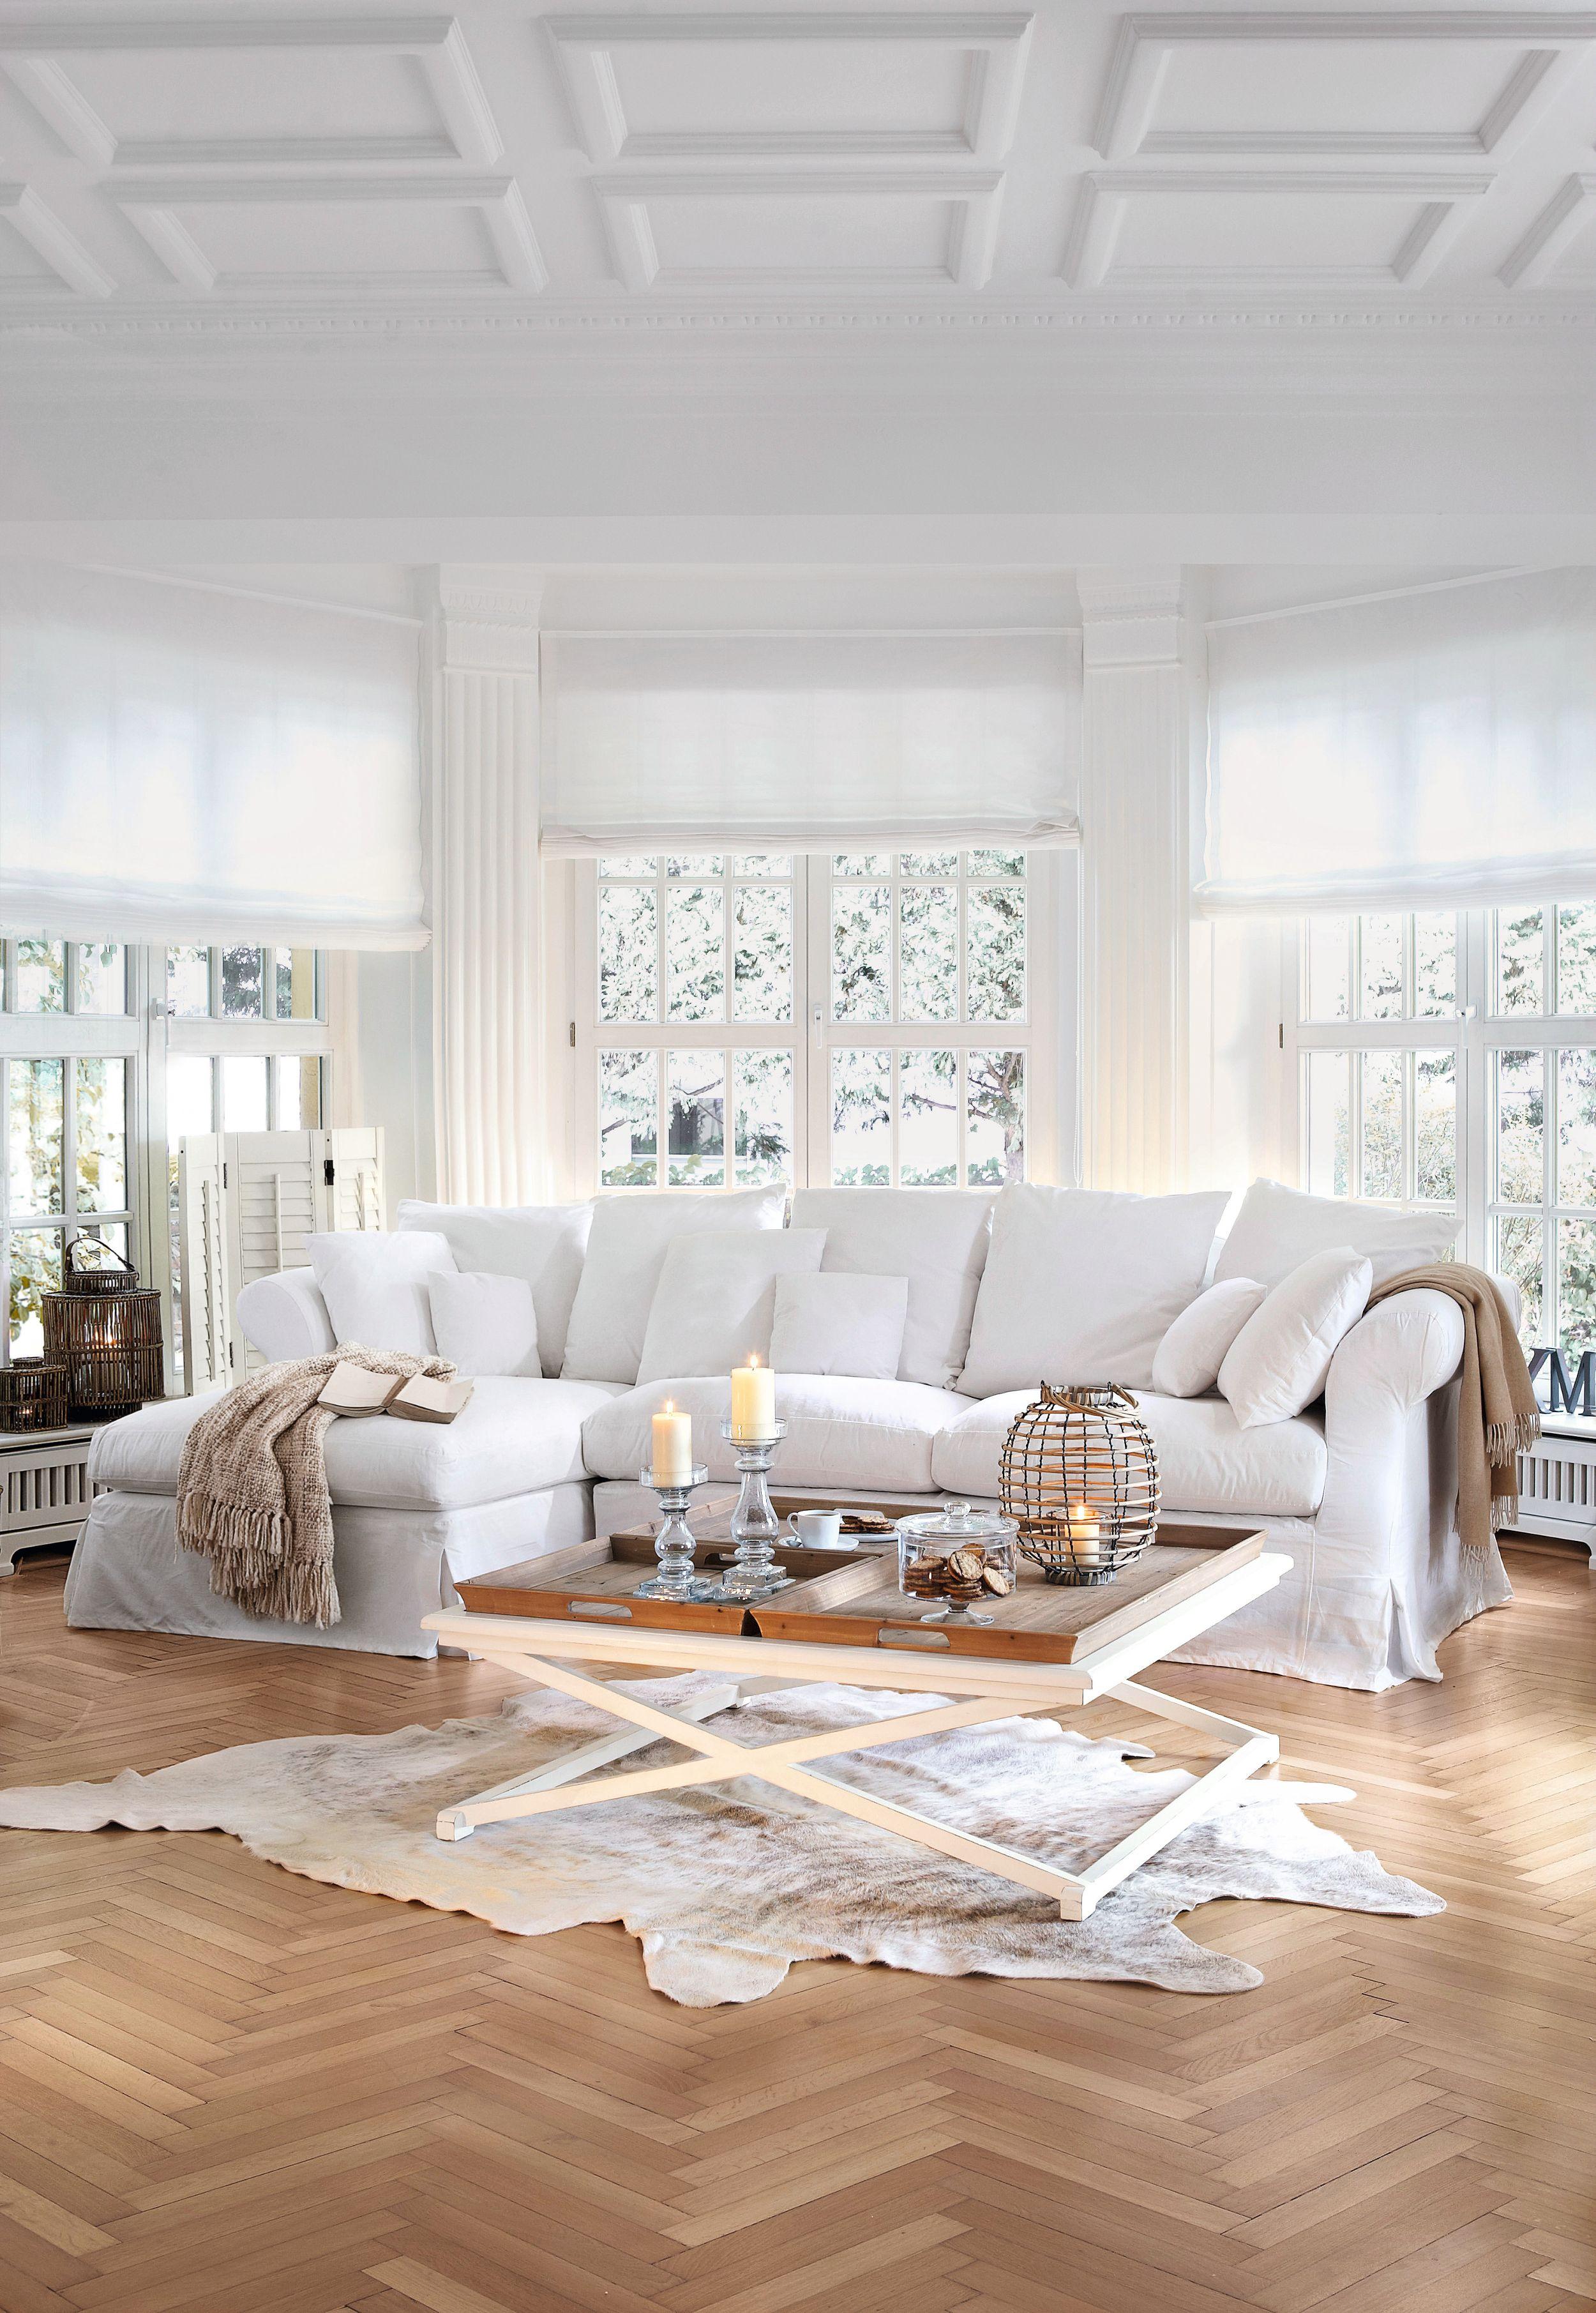 Sofa New Haven Loberon Weiss White Home Sweet Home Wohnzimmer